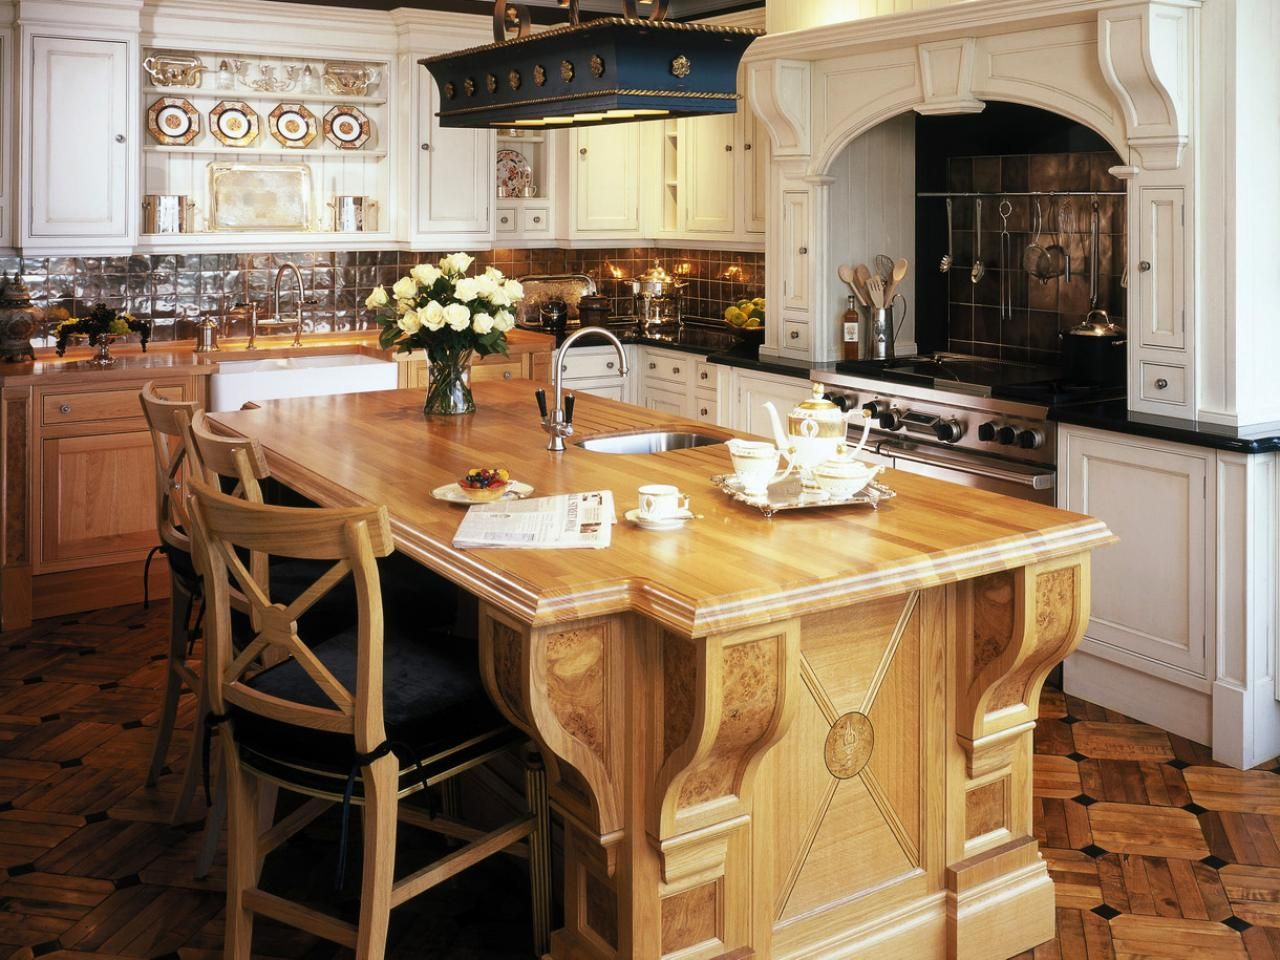 kitchen countertops: beautiful, functional design options | kitschy